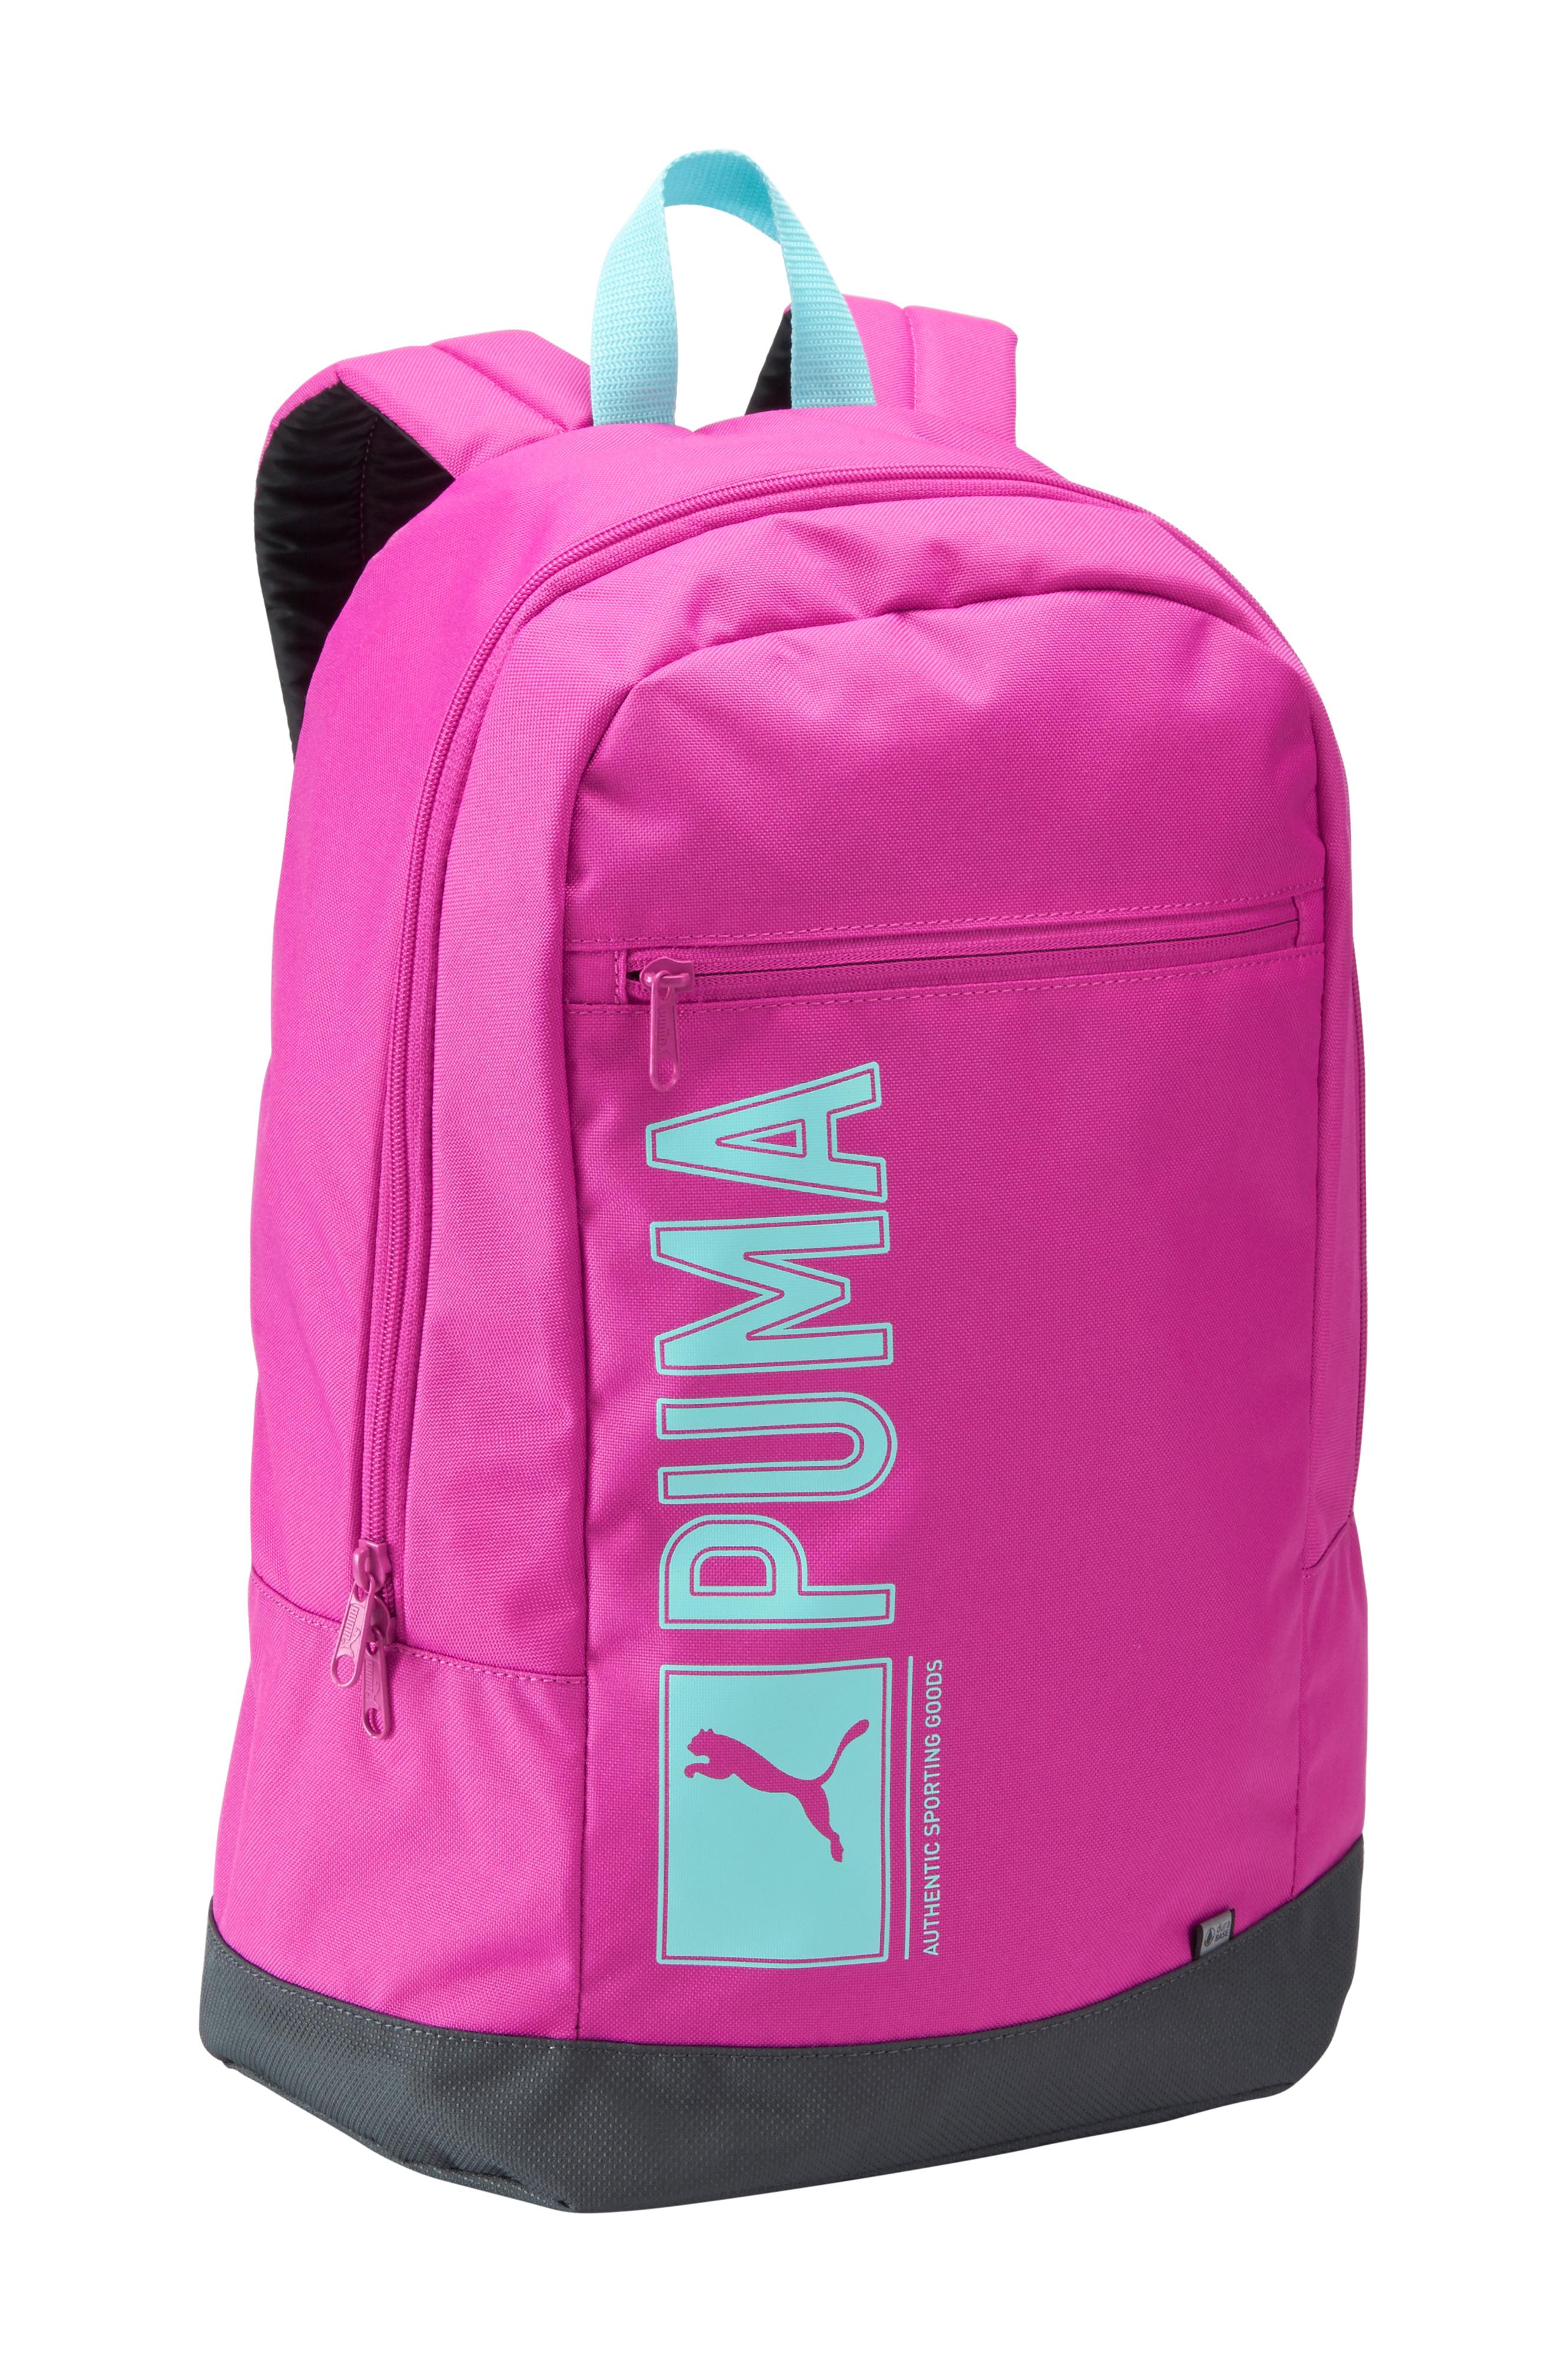 uusi tuote säästää jopa 80% paras online Puma Pioneer Backpack -reppu - Liila - Naiset - Ellos.fi